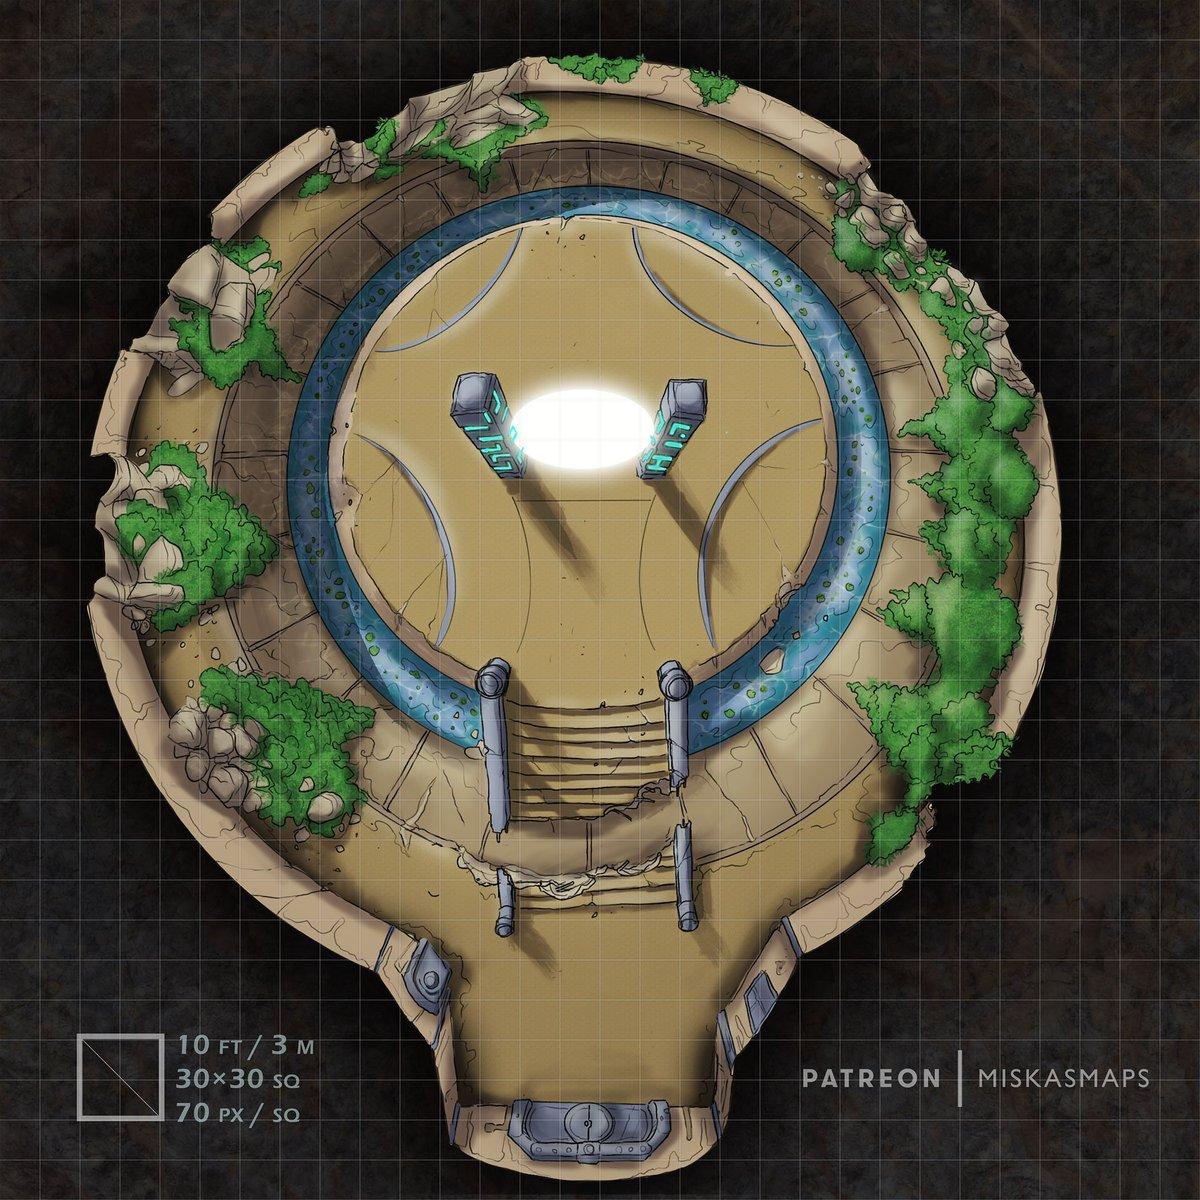 #NobodyArtistClub Hi, I'm Miska and I draw deckplans, dungeons, and battlemaps for RPGs https://t.co/J969JxSnV8